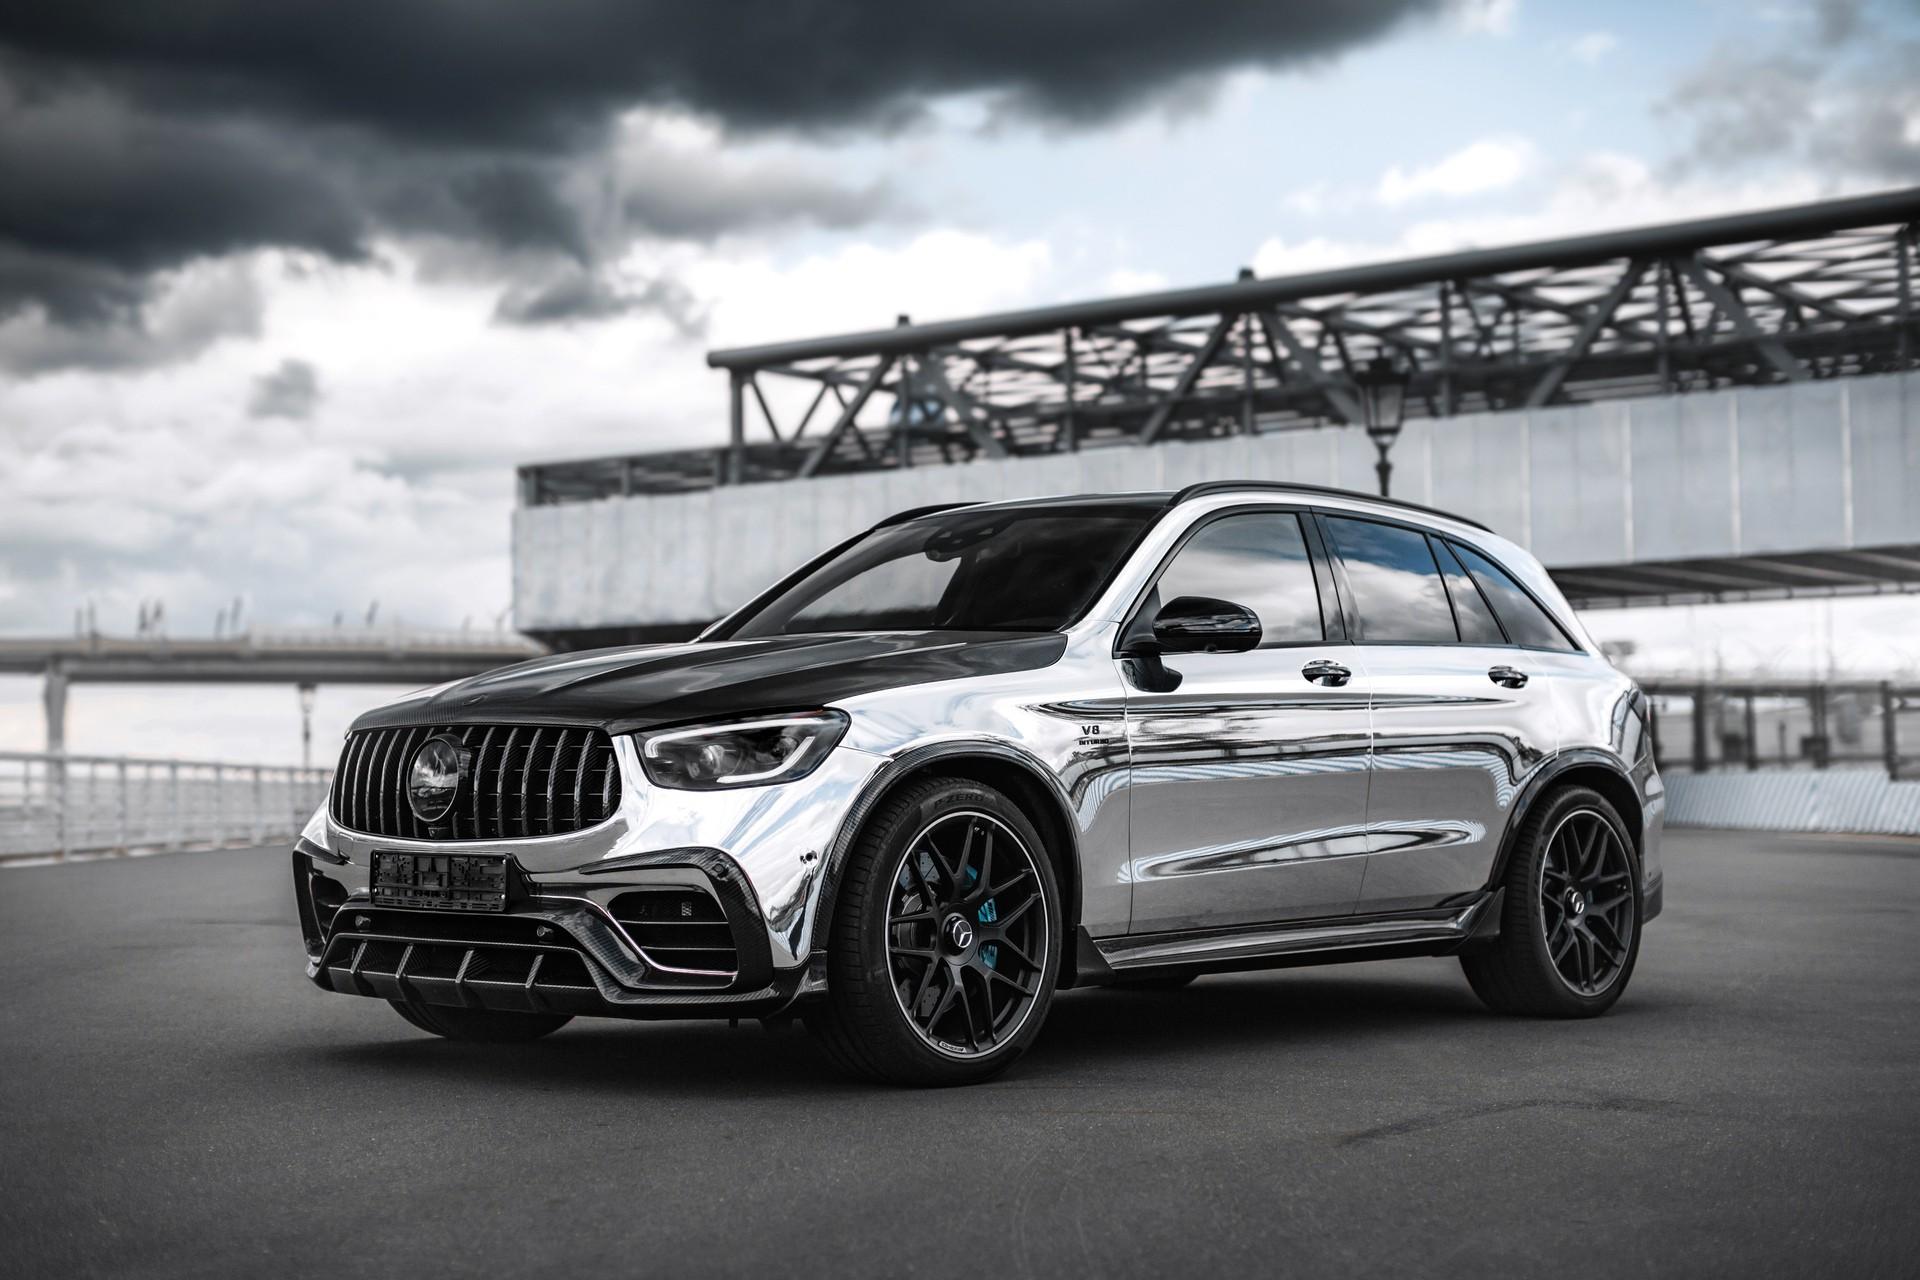 Тюнинг TopCar Wagon Inferno для Mercedes GLC-class